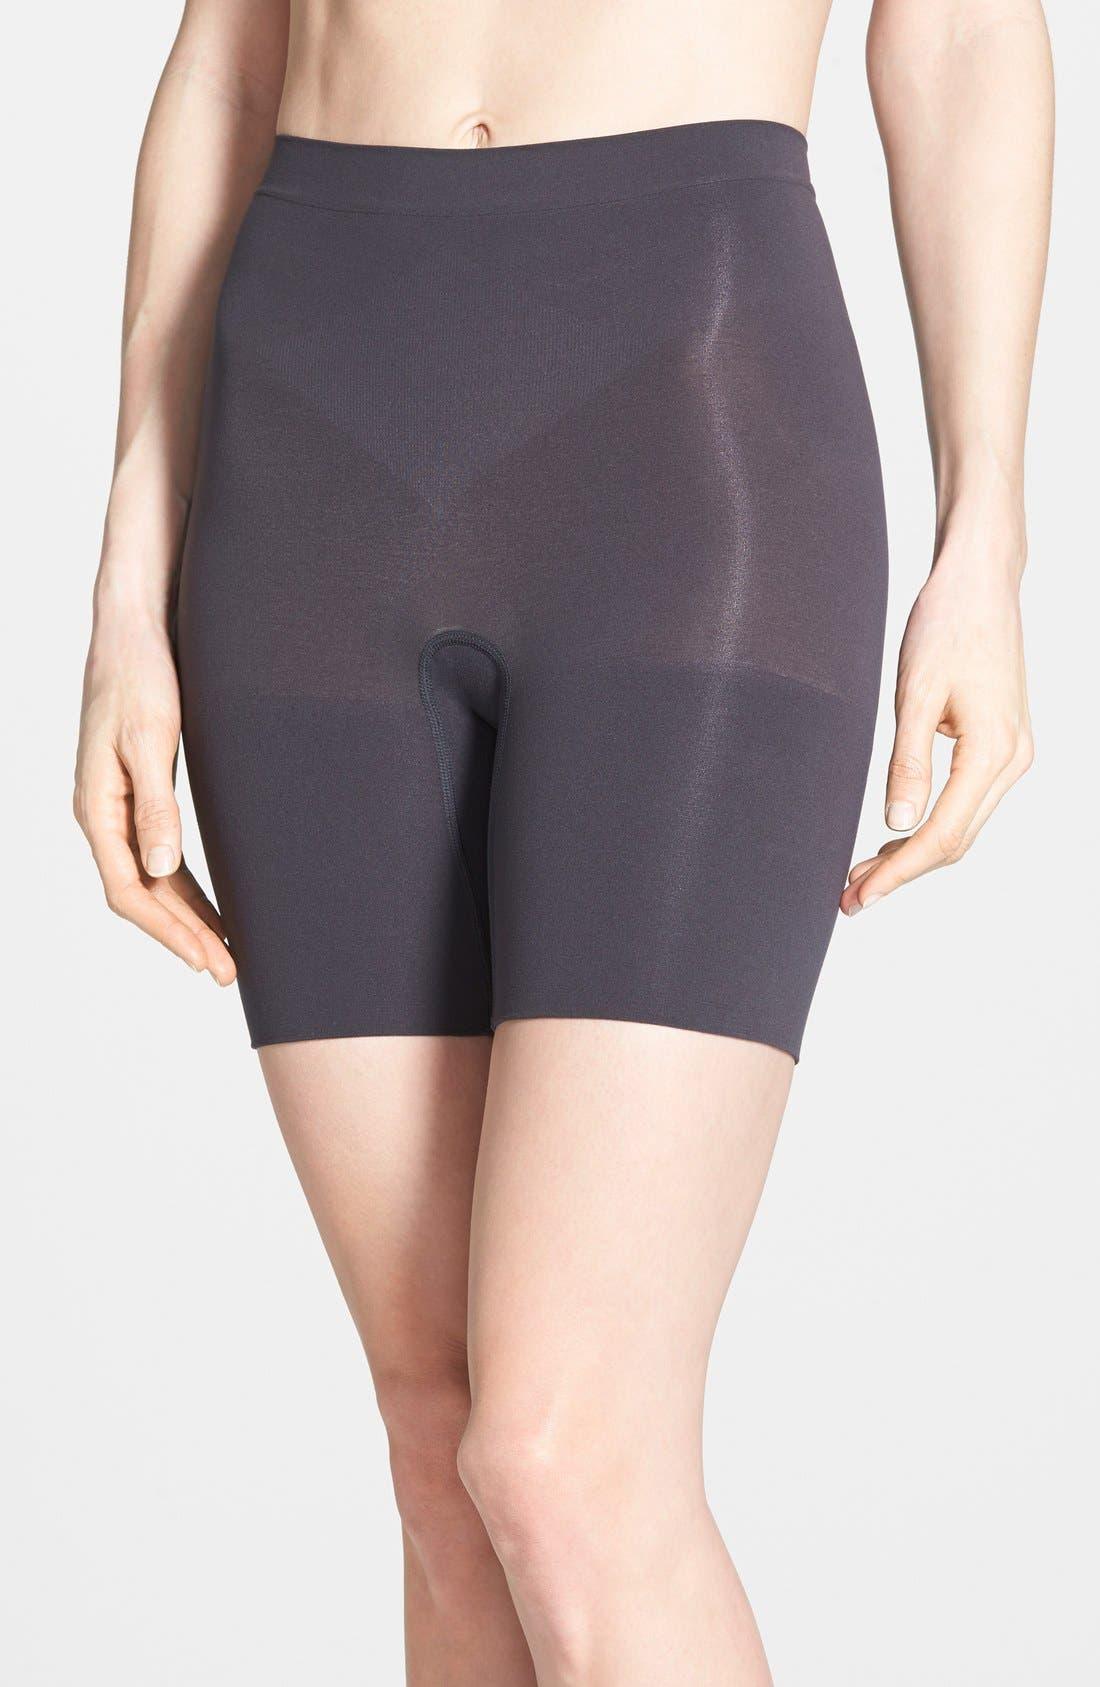 Power Short Mid Thigh Shaper,                         Main,                         color, Very Black